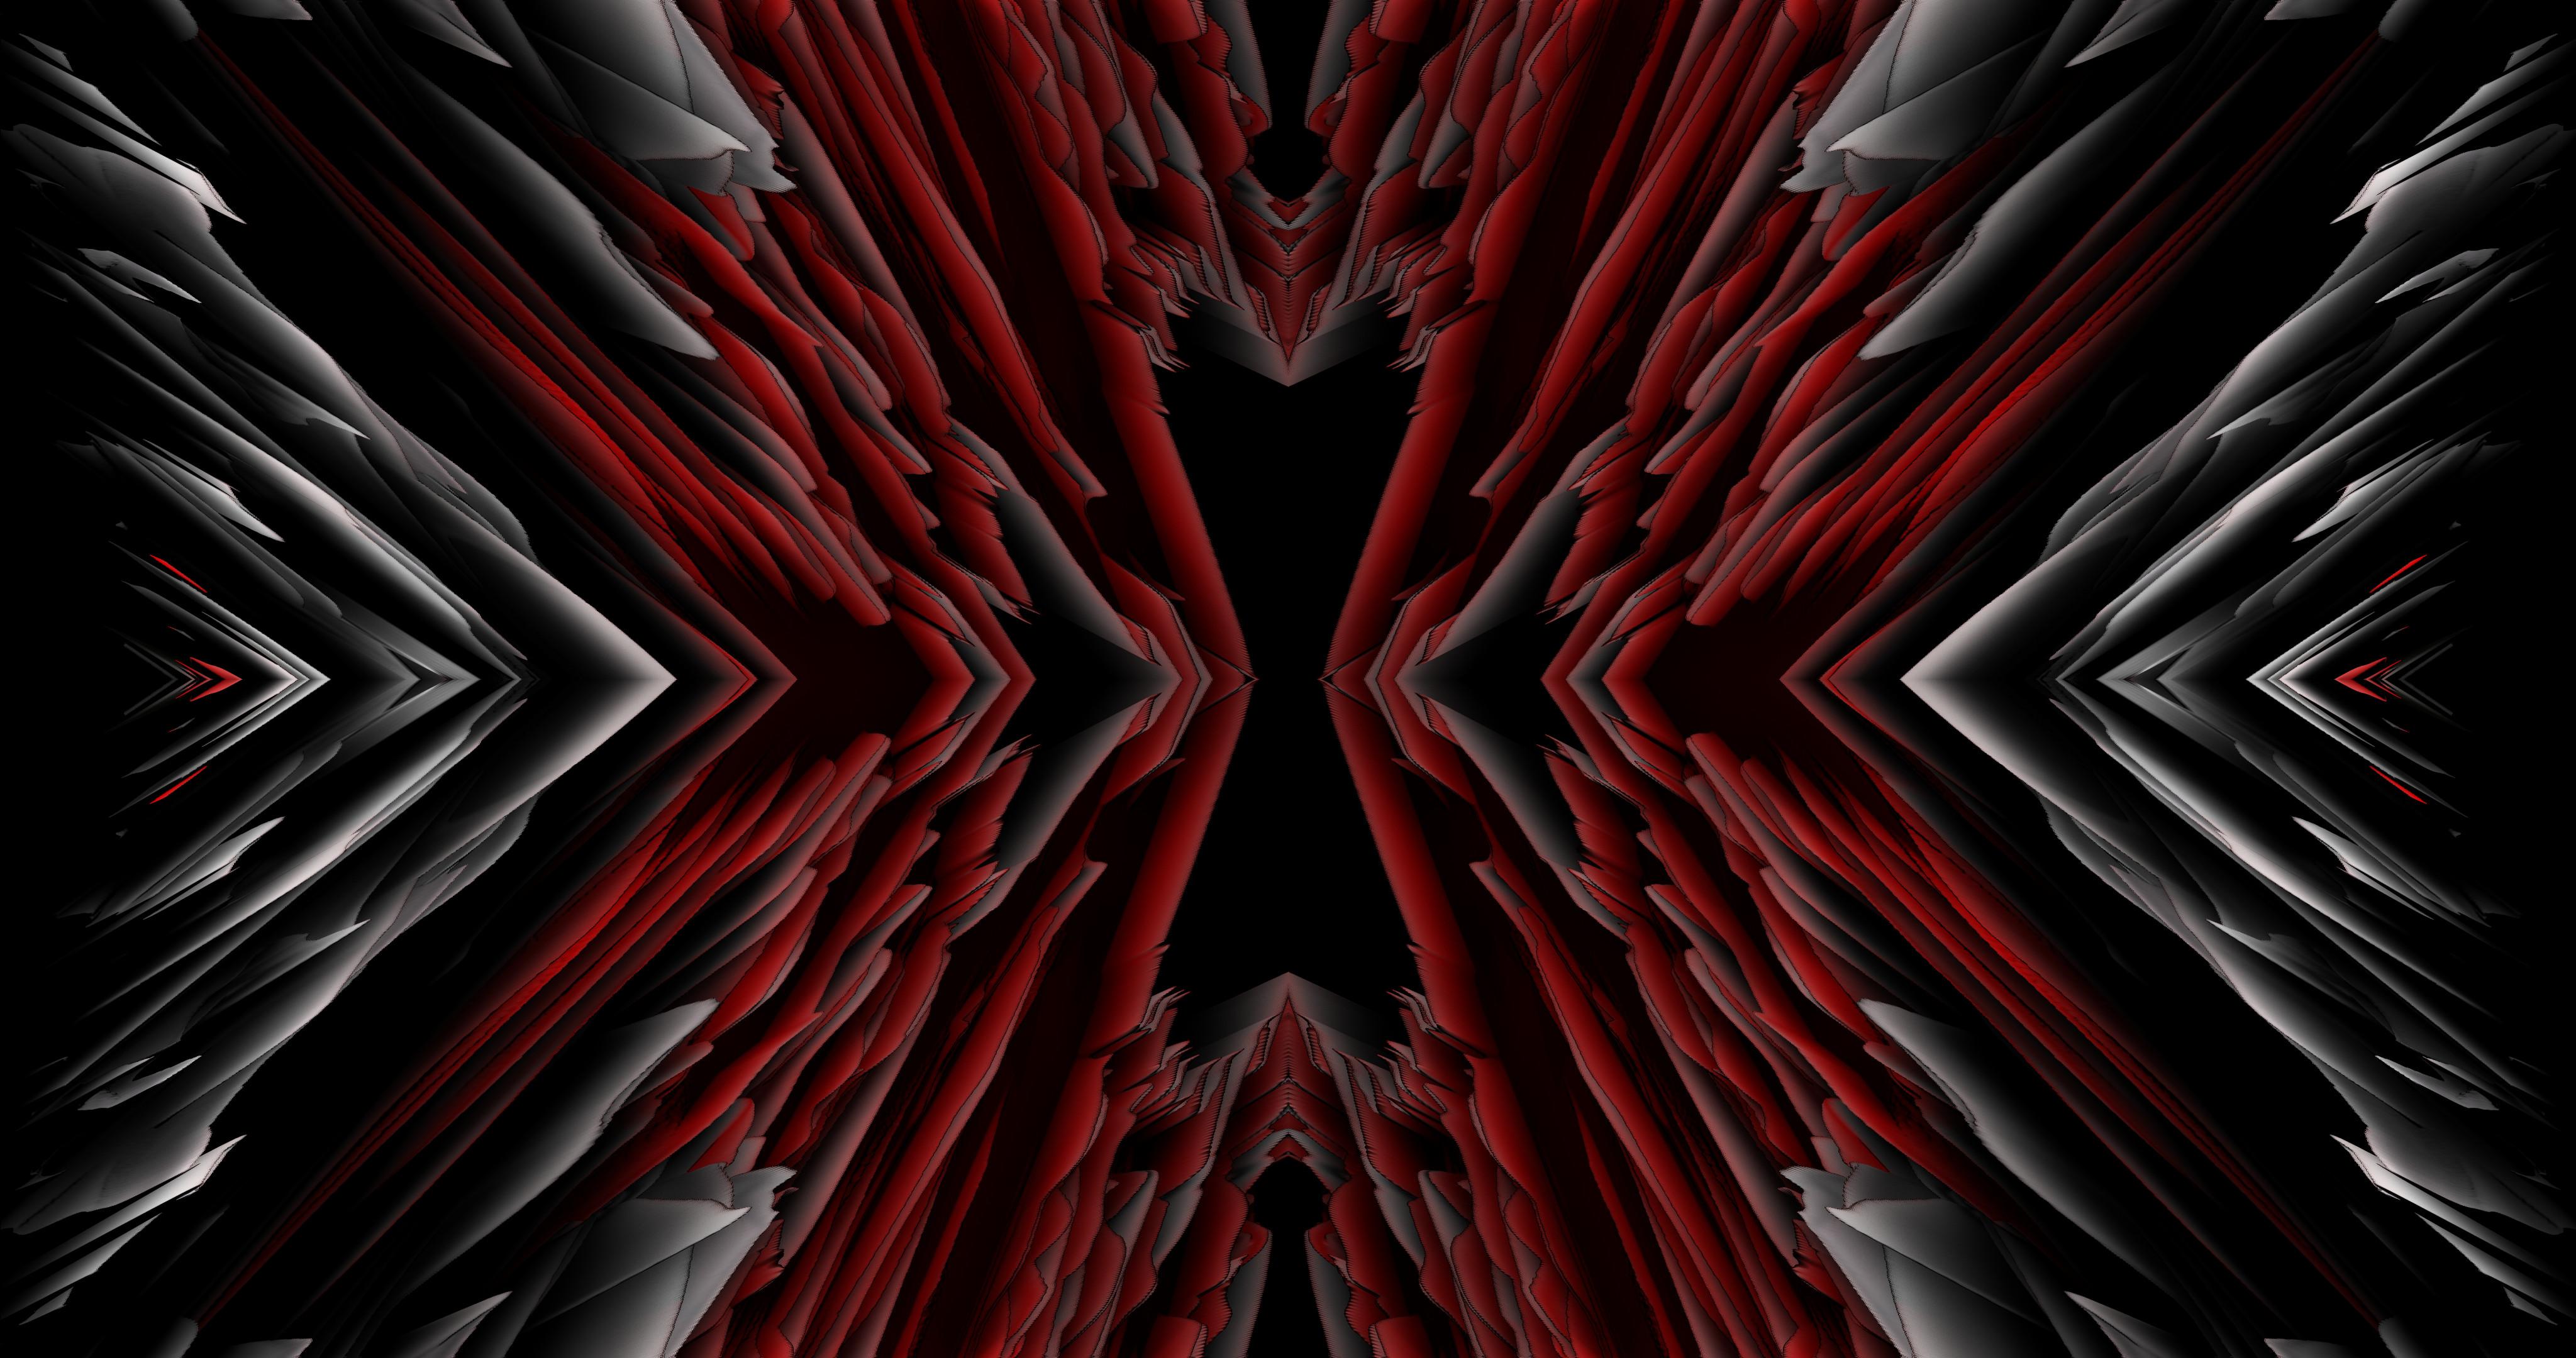 FREE redSILFER 4K Wallpaper by XxStryveRxX